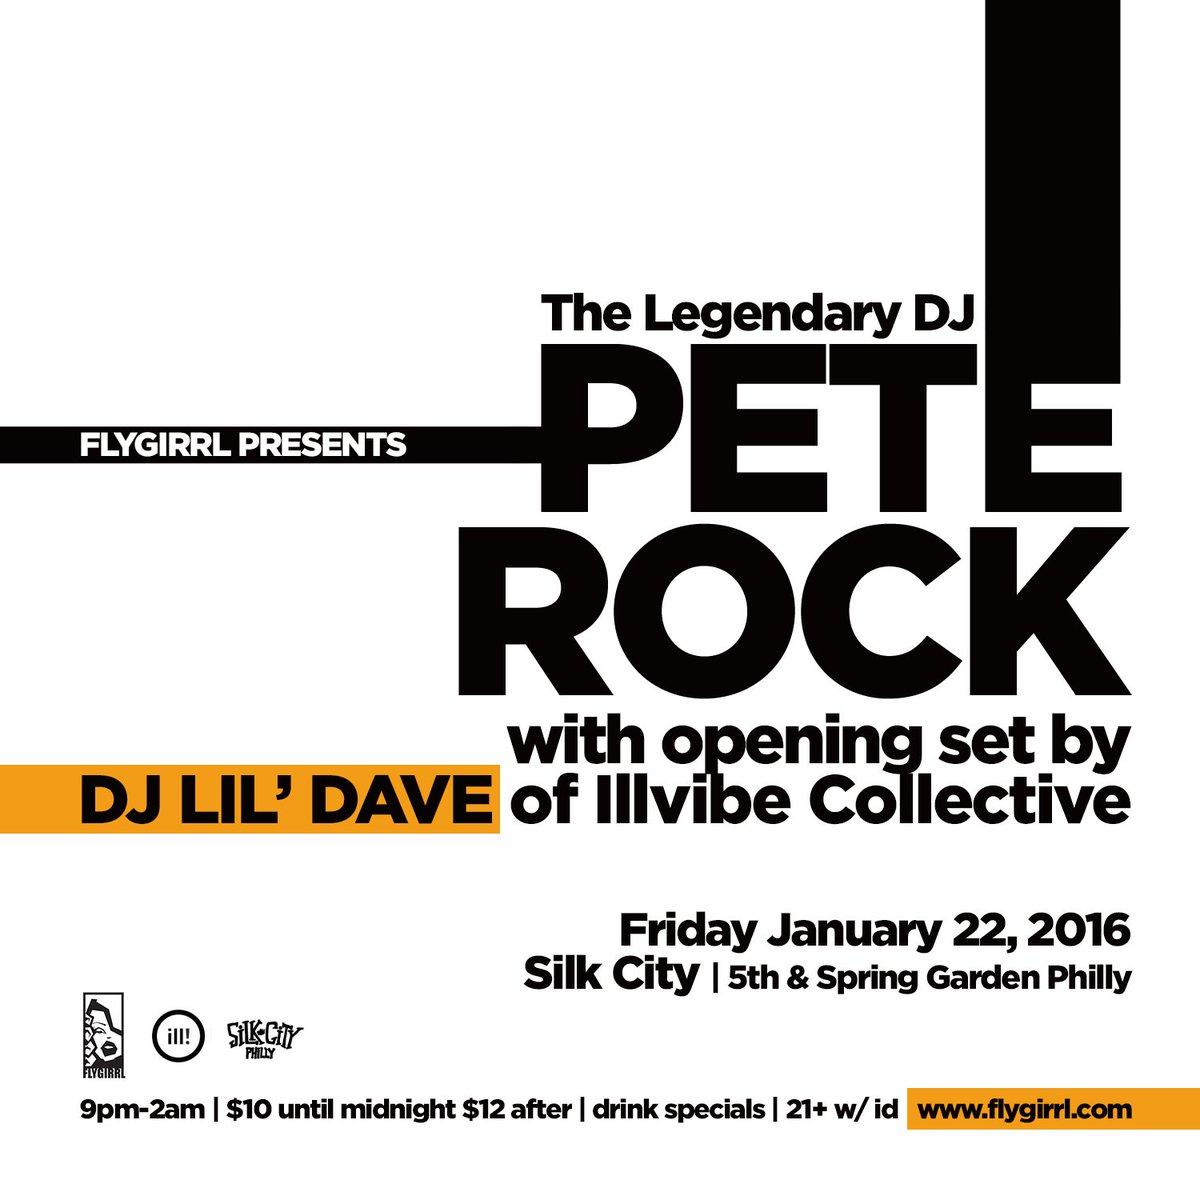 #PhillyEventAlert! Legendary DJ @PeteRock x @lildave215 at @SilkCityDiner on January 22! https://t.co/FTCp0J6bAW https://t.co/kowSMzg81F